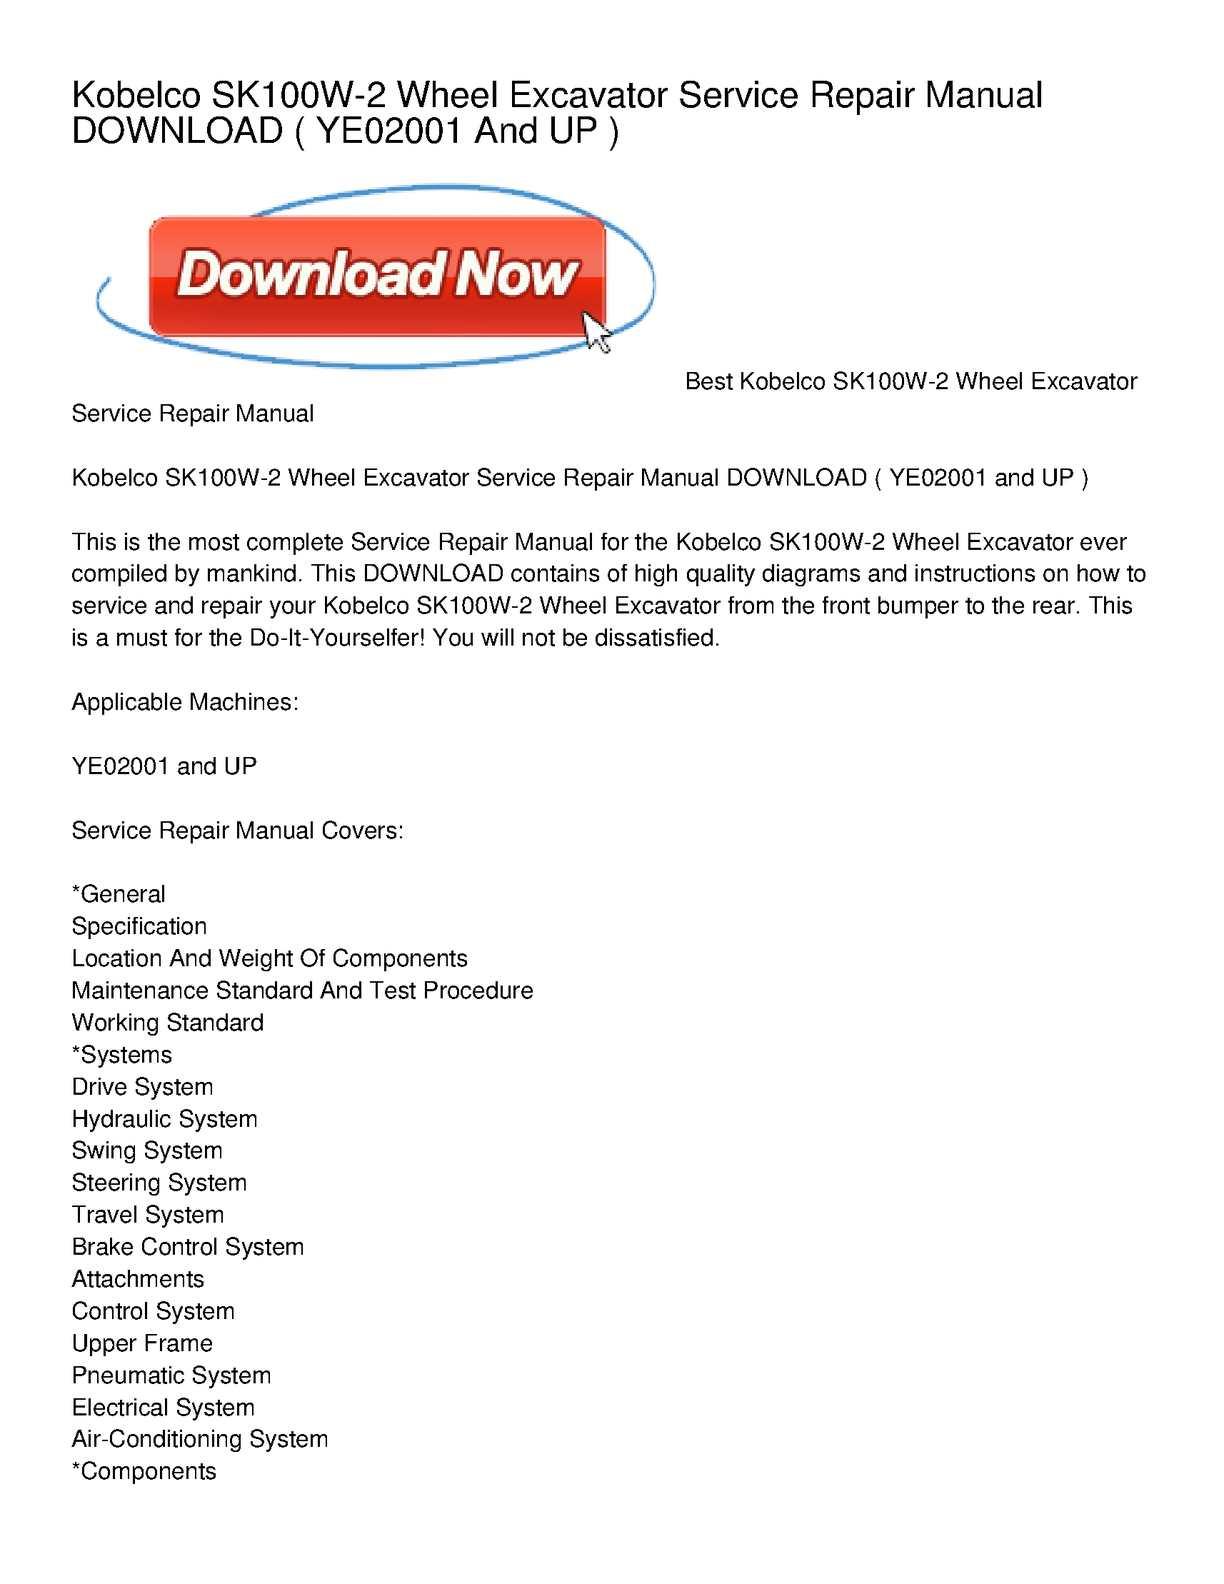 Calamo Kobelco Sk100w 2 Wheel Excavator Service Repair Manual Air Conditioning Maintenance Diagram Basic Showing The Download